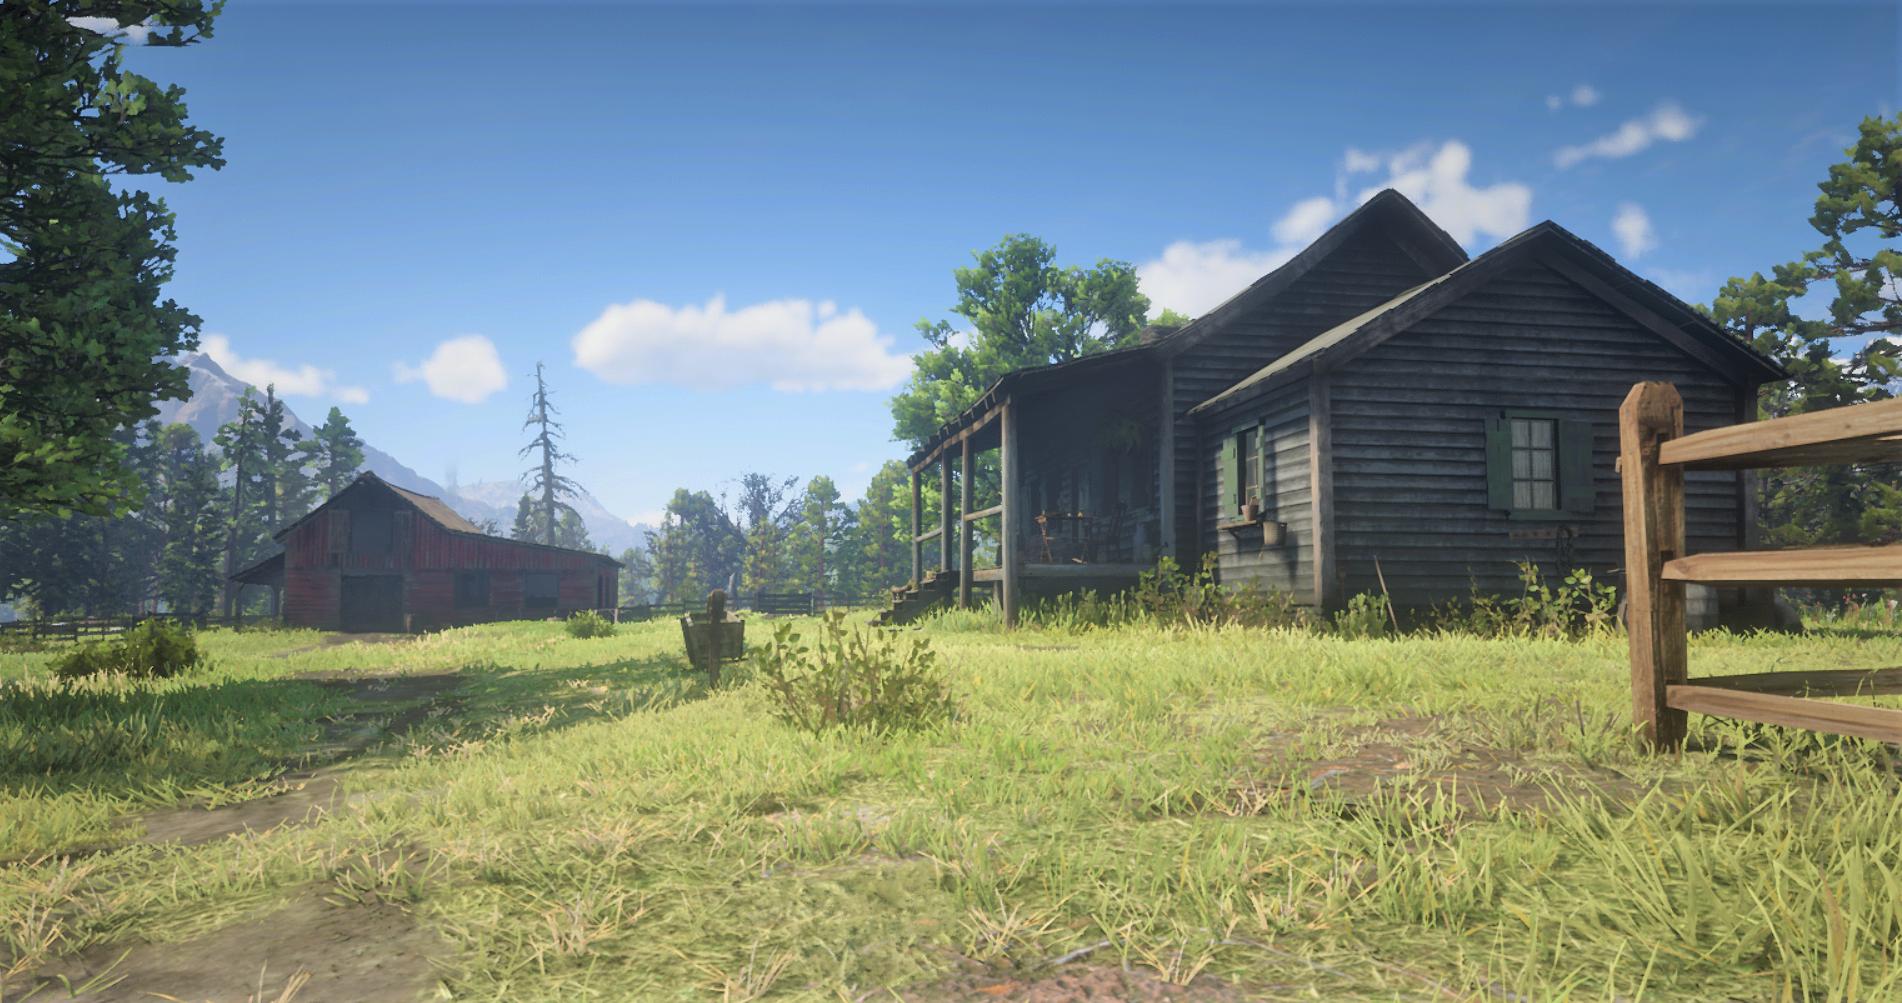 Downes Ranch | Red Dead Wiki | FANDOM powered by Wikia